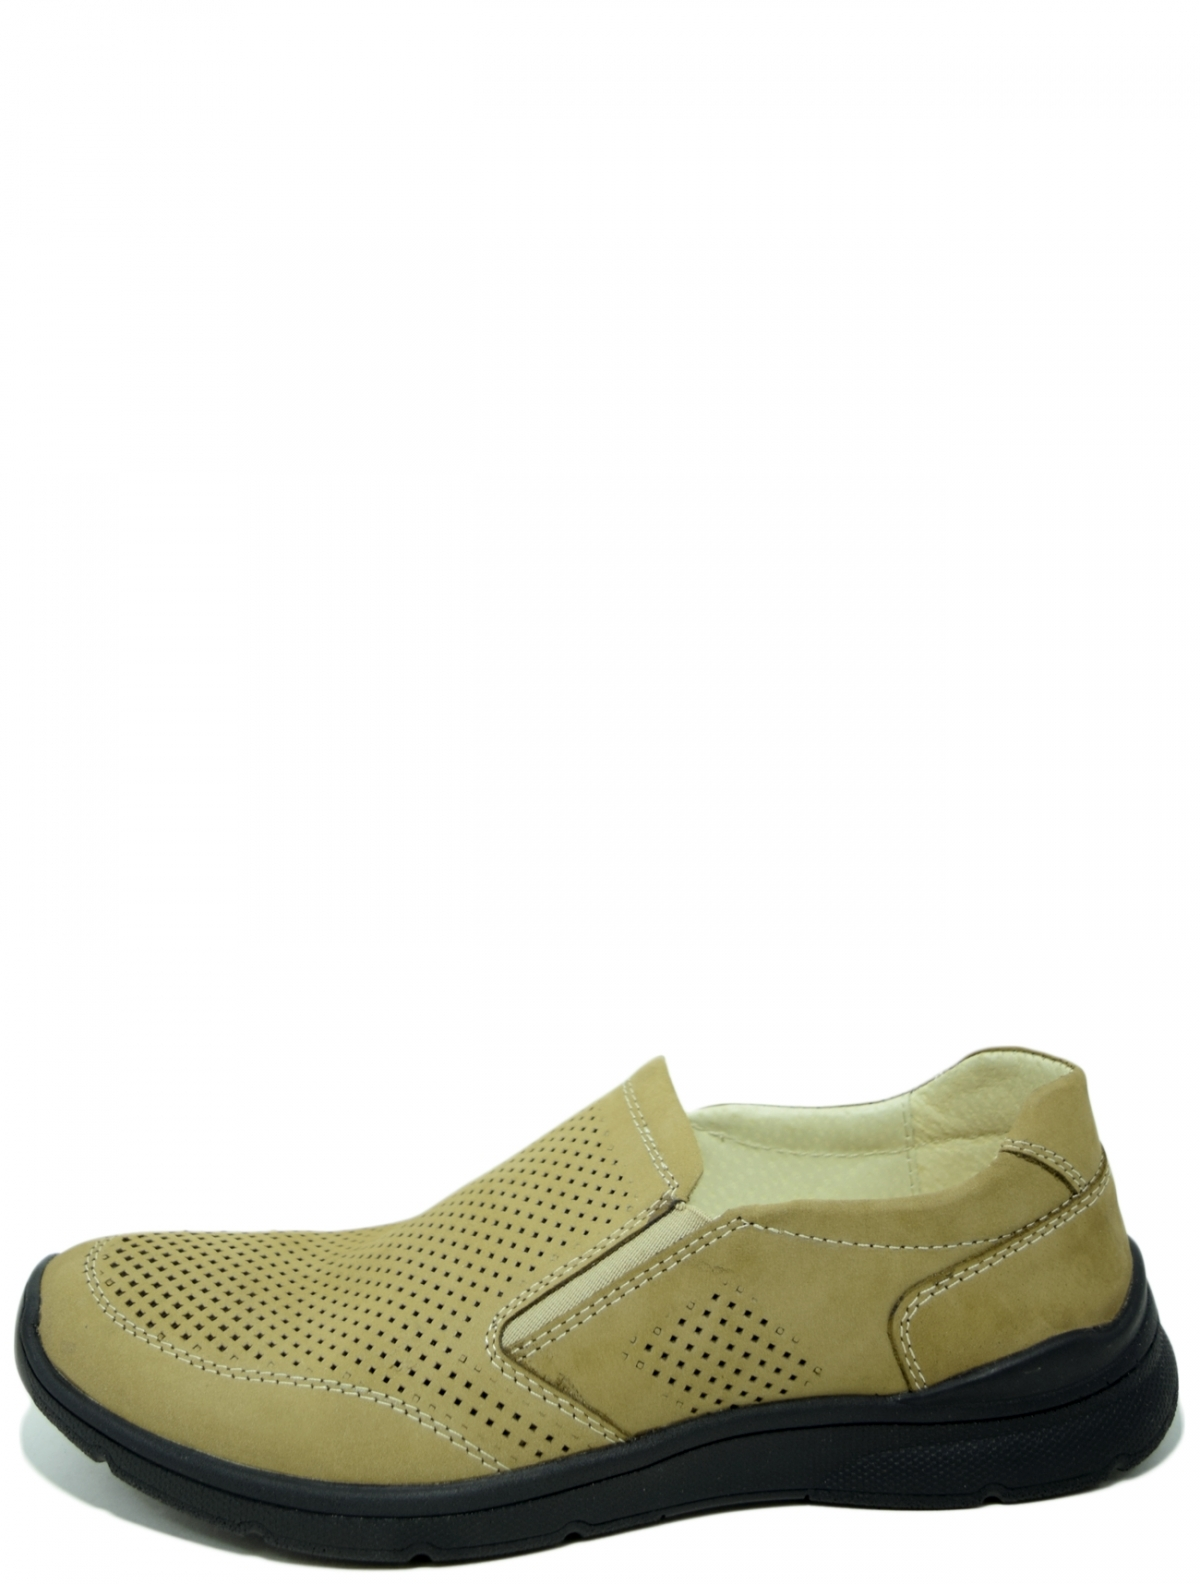 Rooman 905-185-C4N мужские туфли